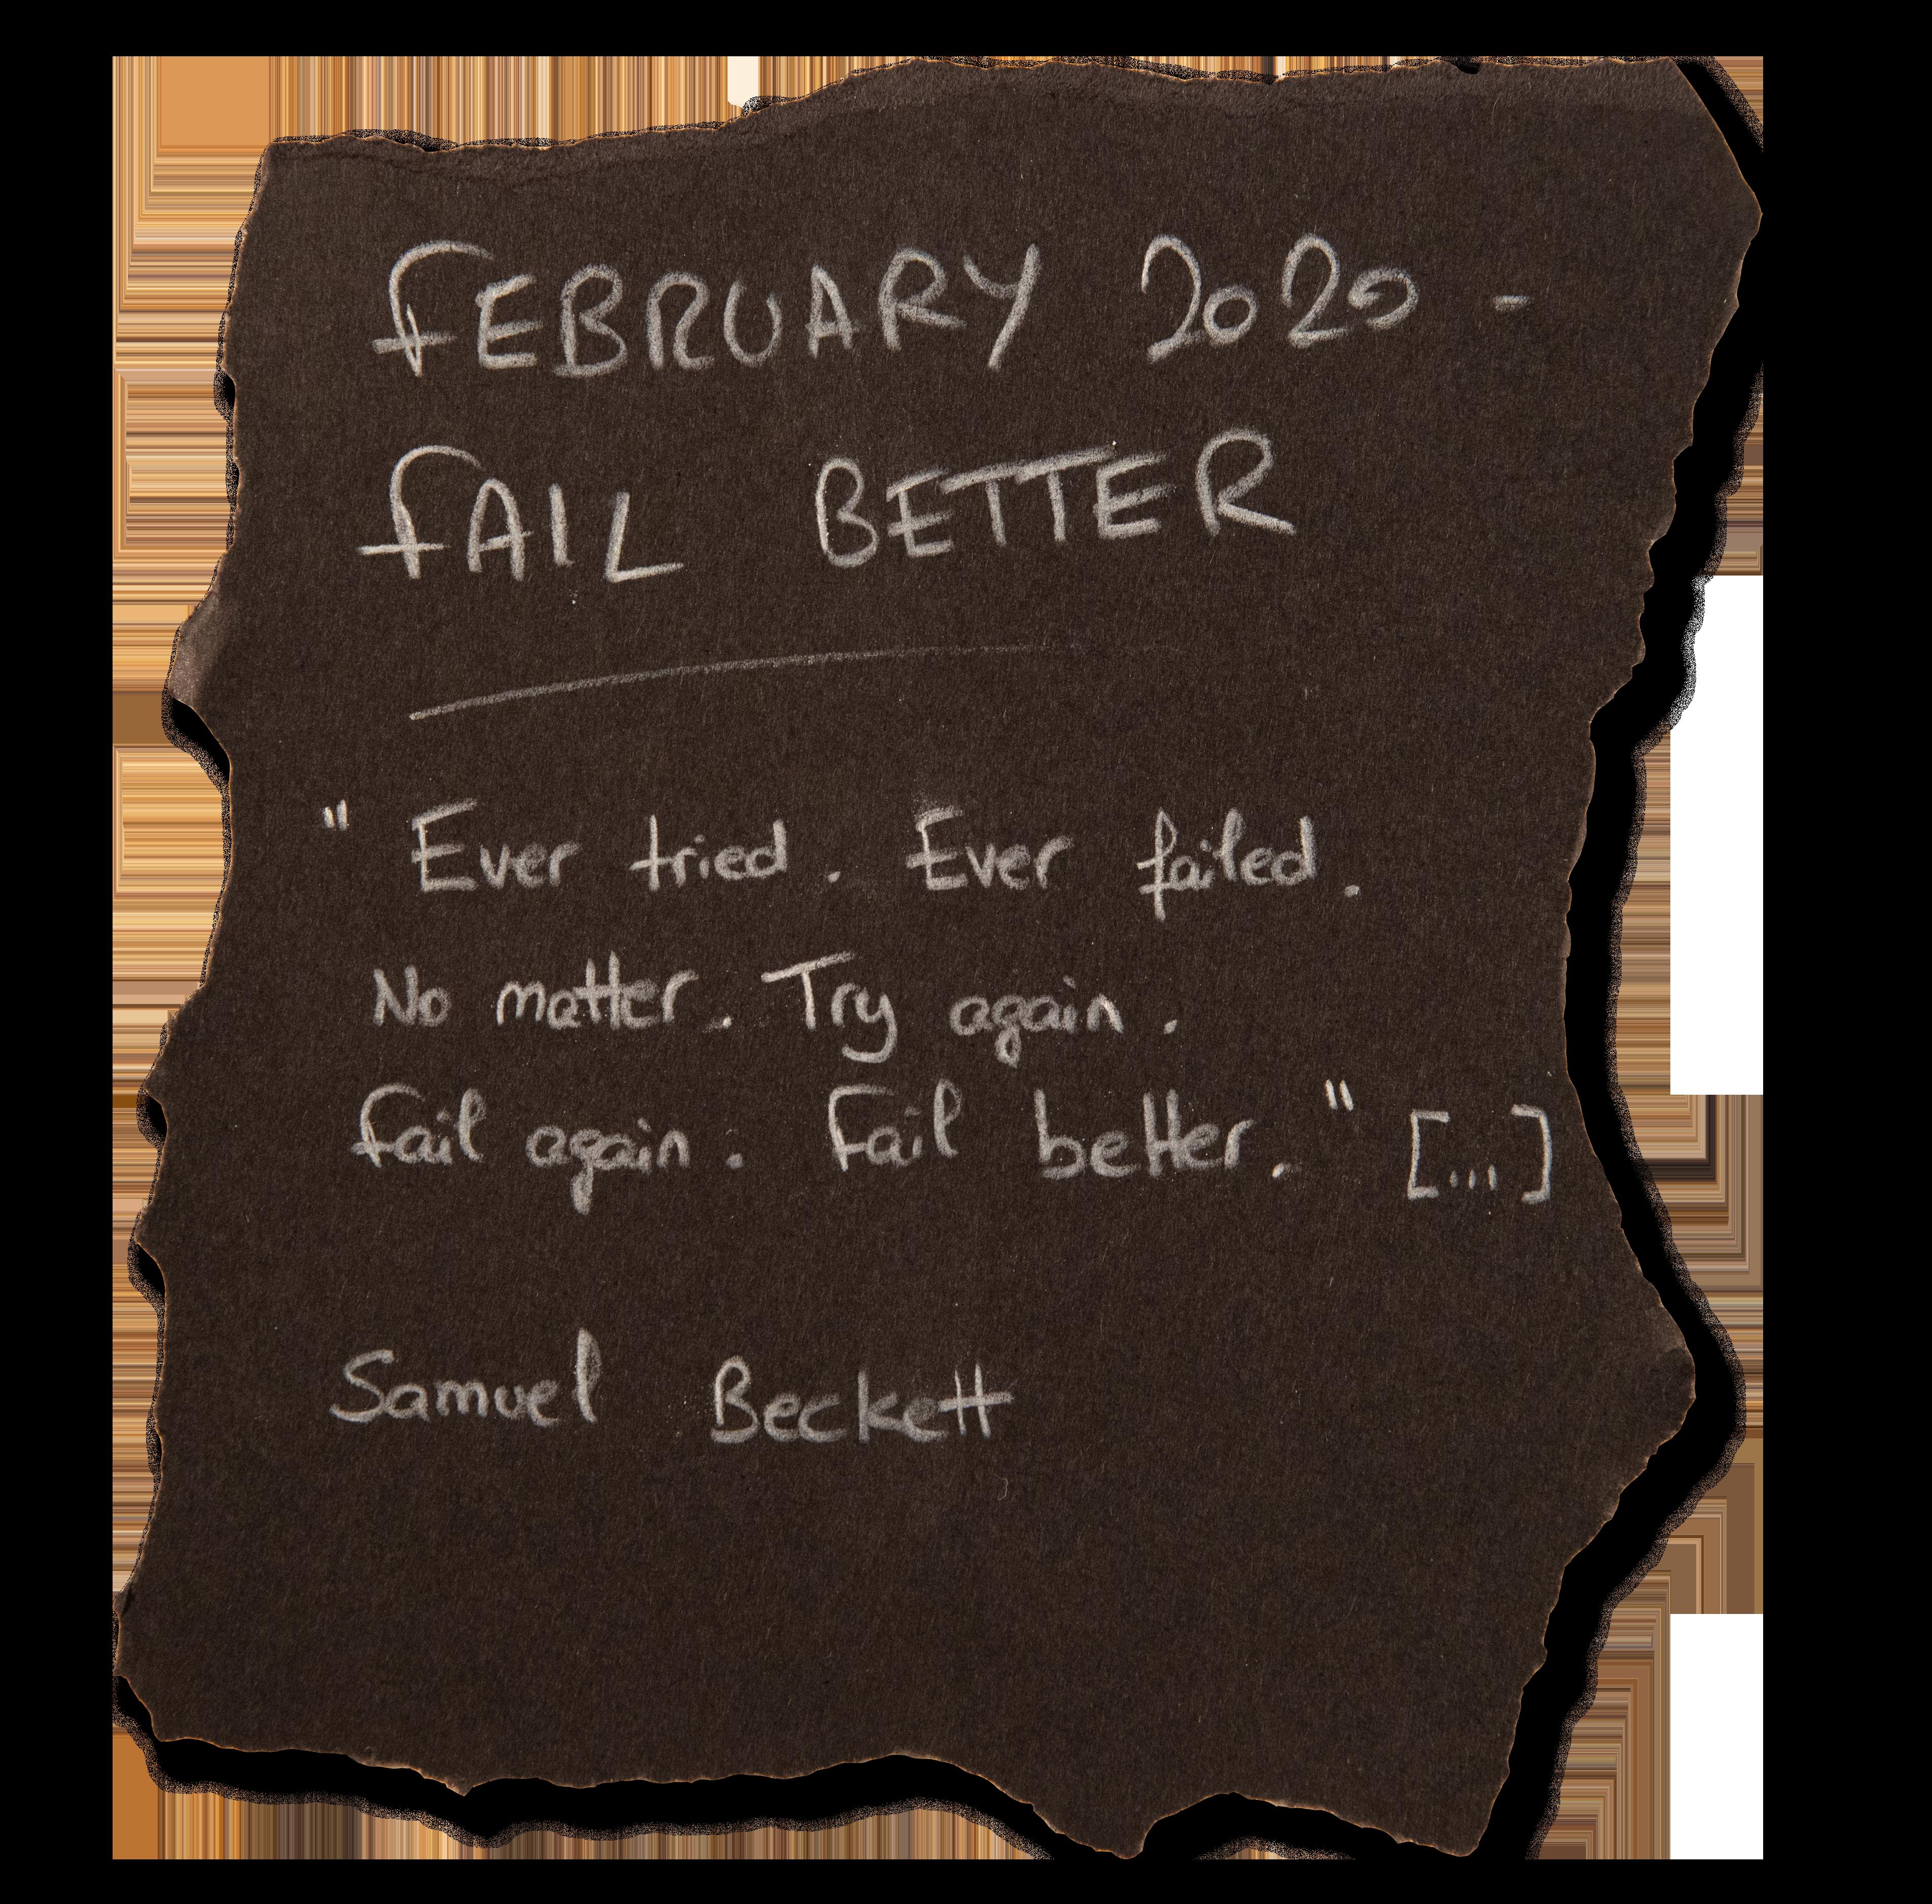 #3 - FEBRUARY 2020 - FAIL BETTER